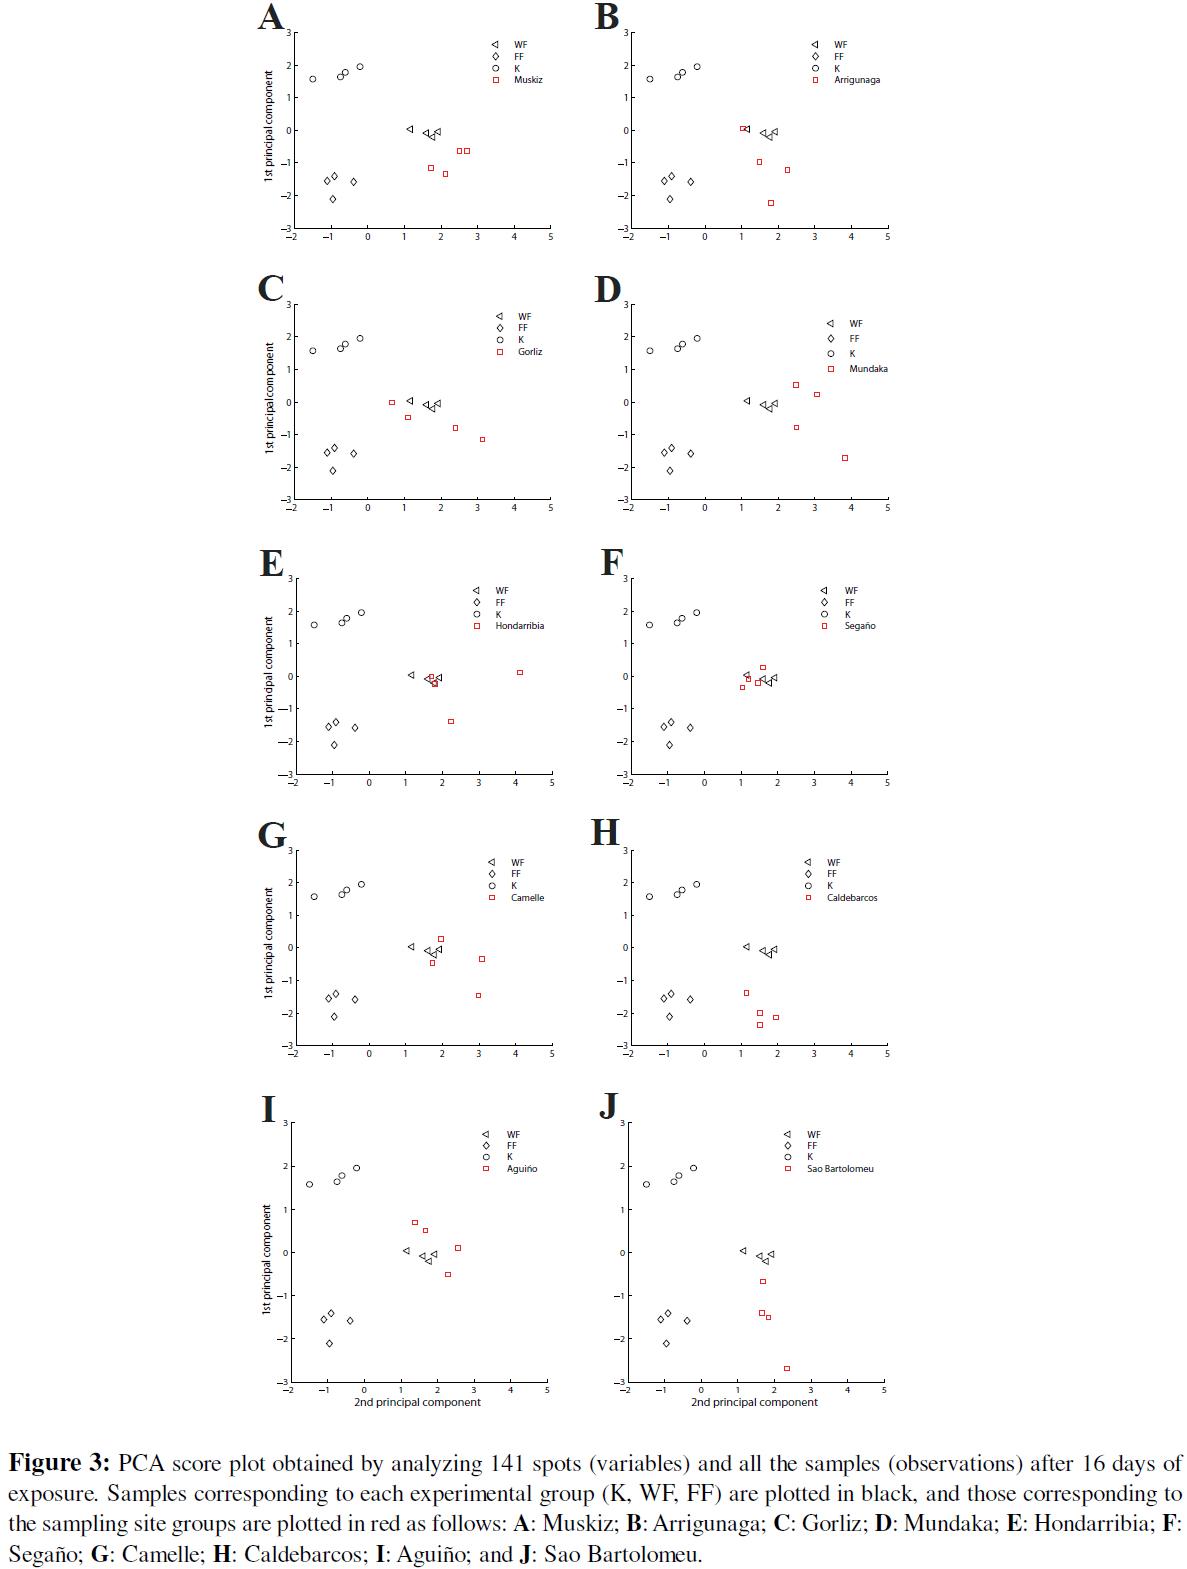 proteomics-bioinformatics-pca-score-all-samples